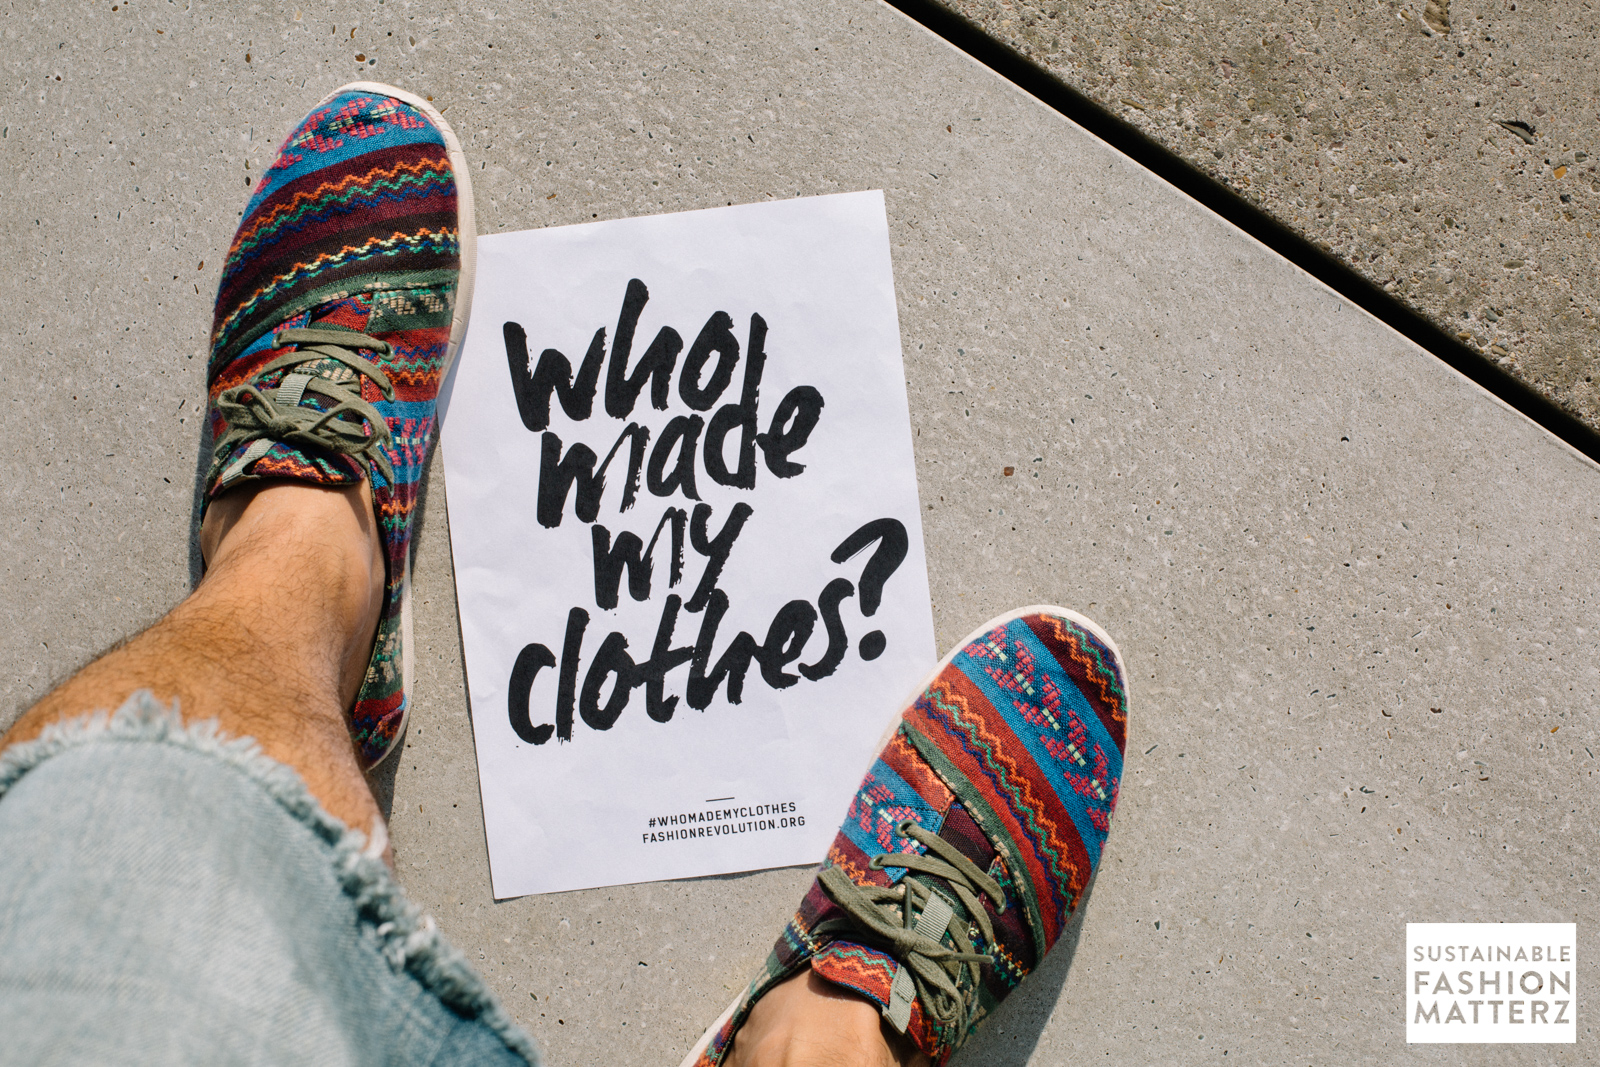 fashion-revolution-by-sustainable-fashion-matterz-107.jpg